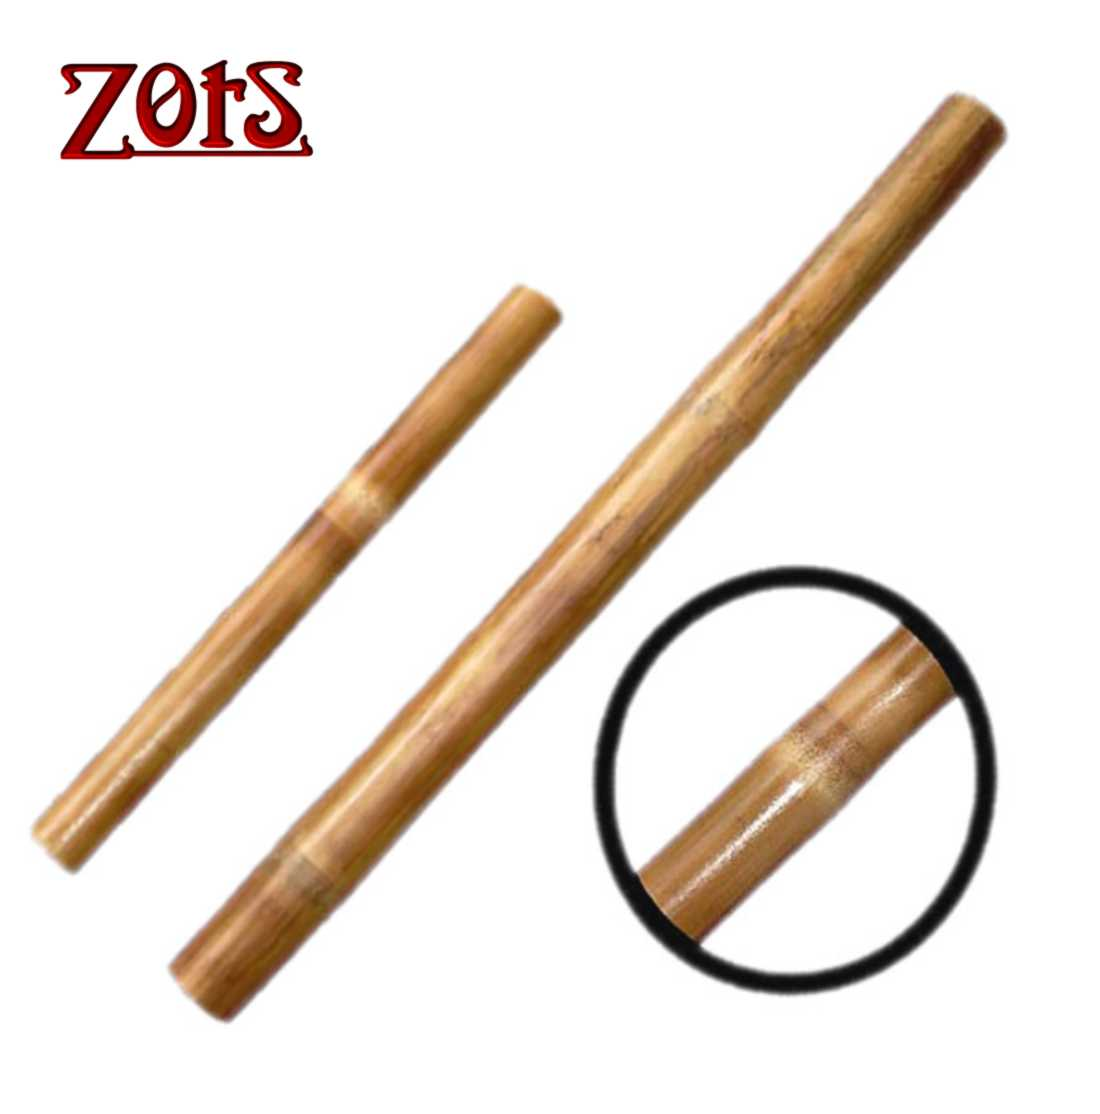 Bambu 35 cm  -  Zots